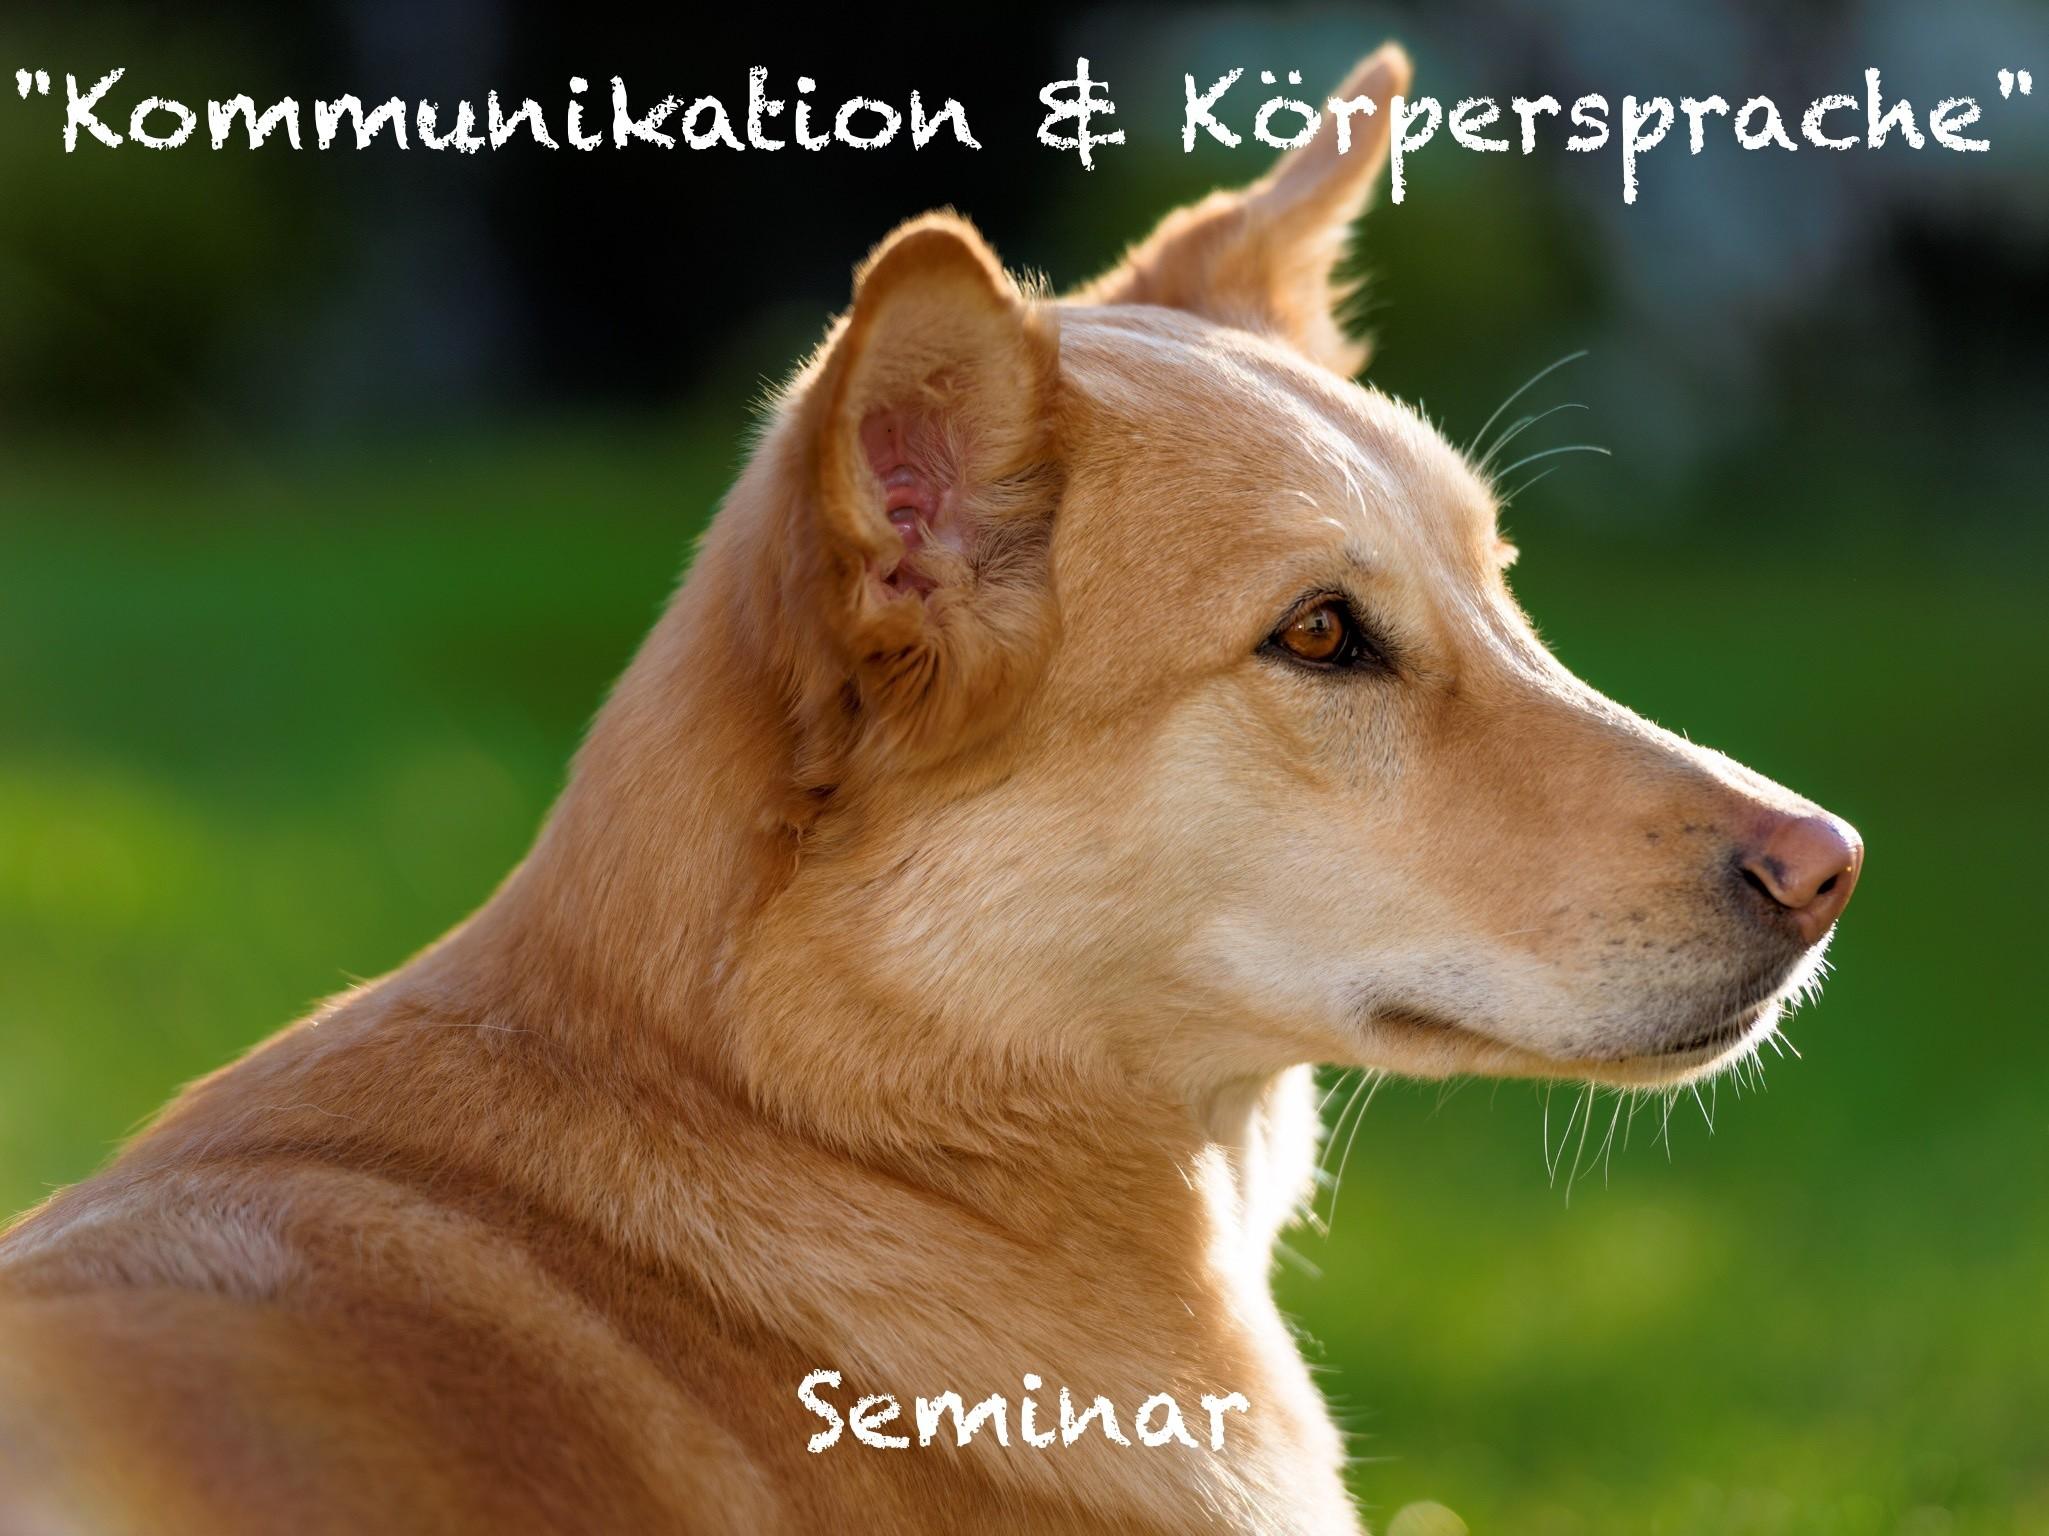 Seminar Kommunikation